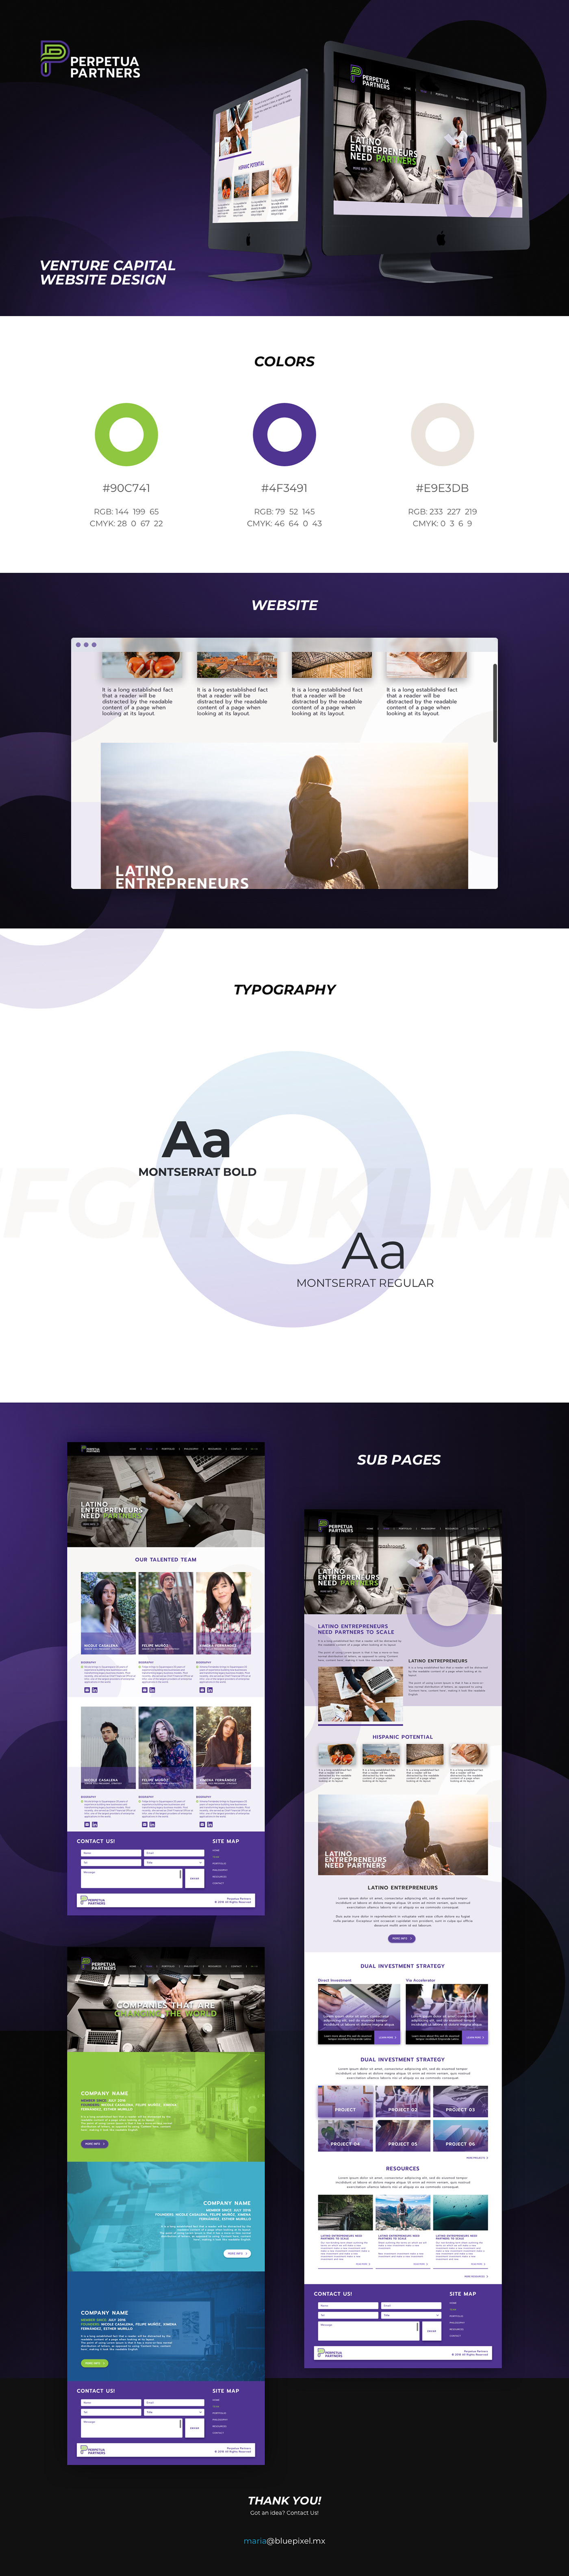 Website vc venture capital Web Design  purple green circles sleek cool clean